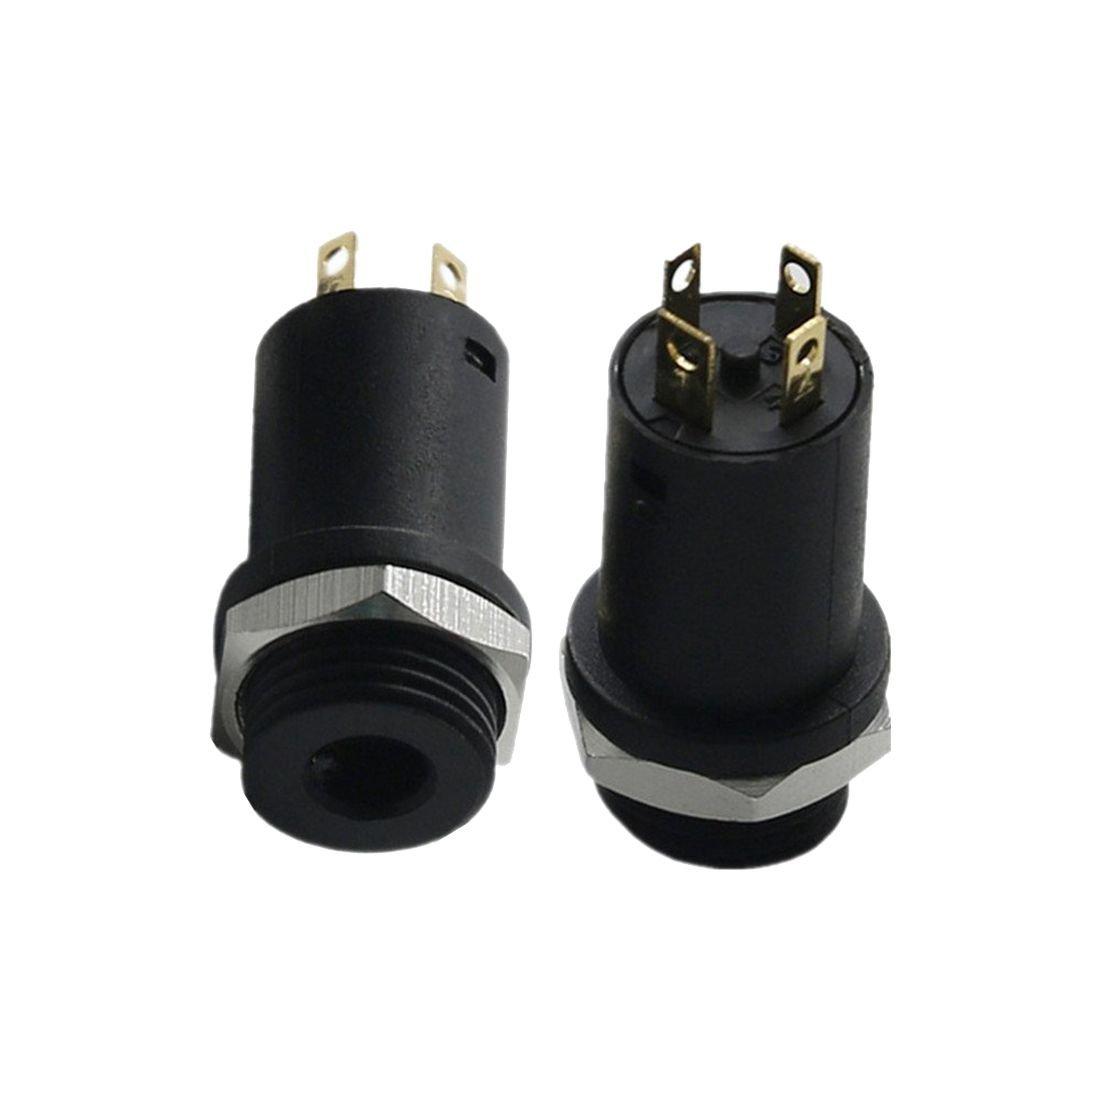 Black 4 Conductor SODIAL 10PCS 3.5MM Mini Stereo Female Panel Mount Headphone Jack Solder